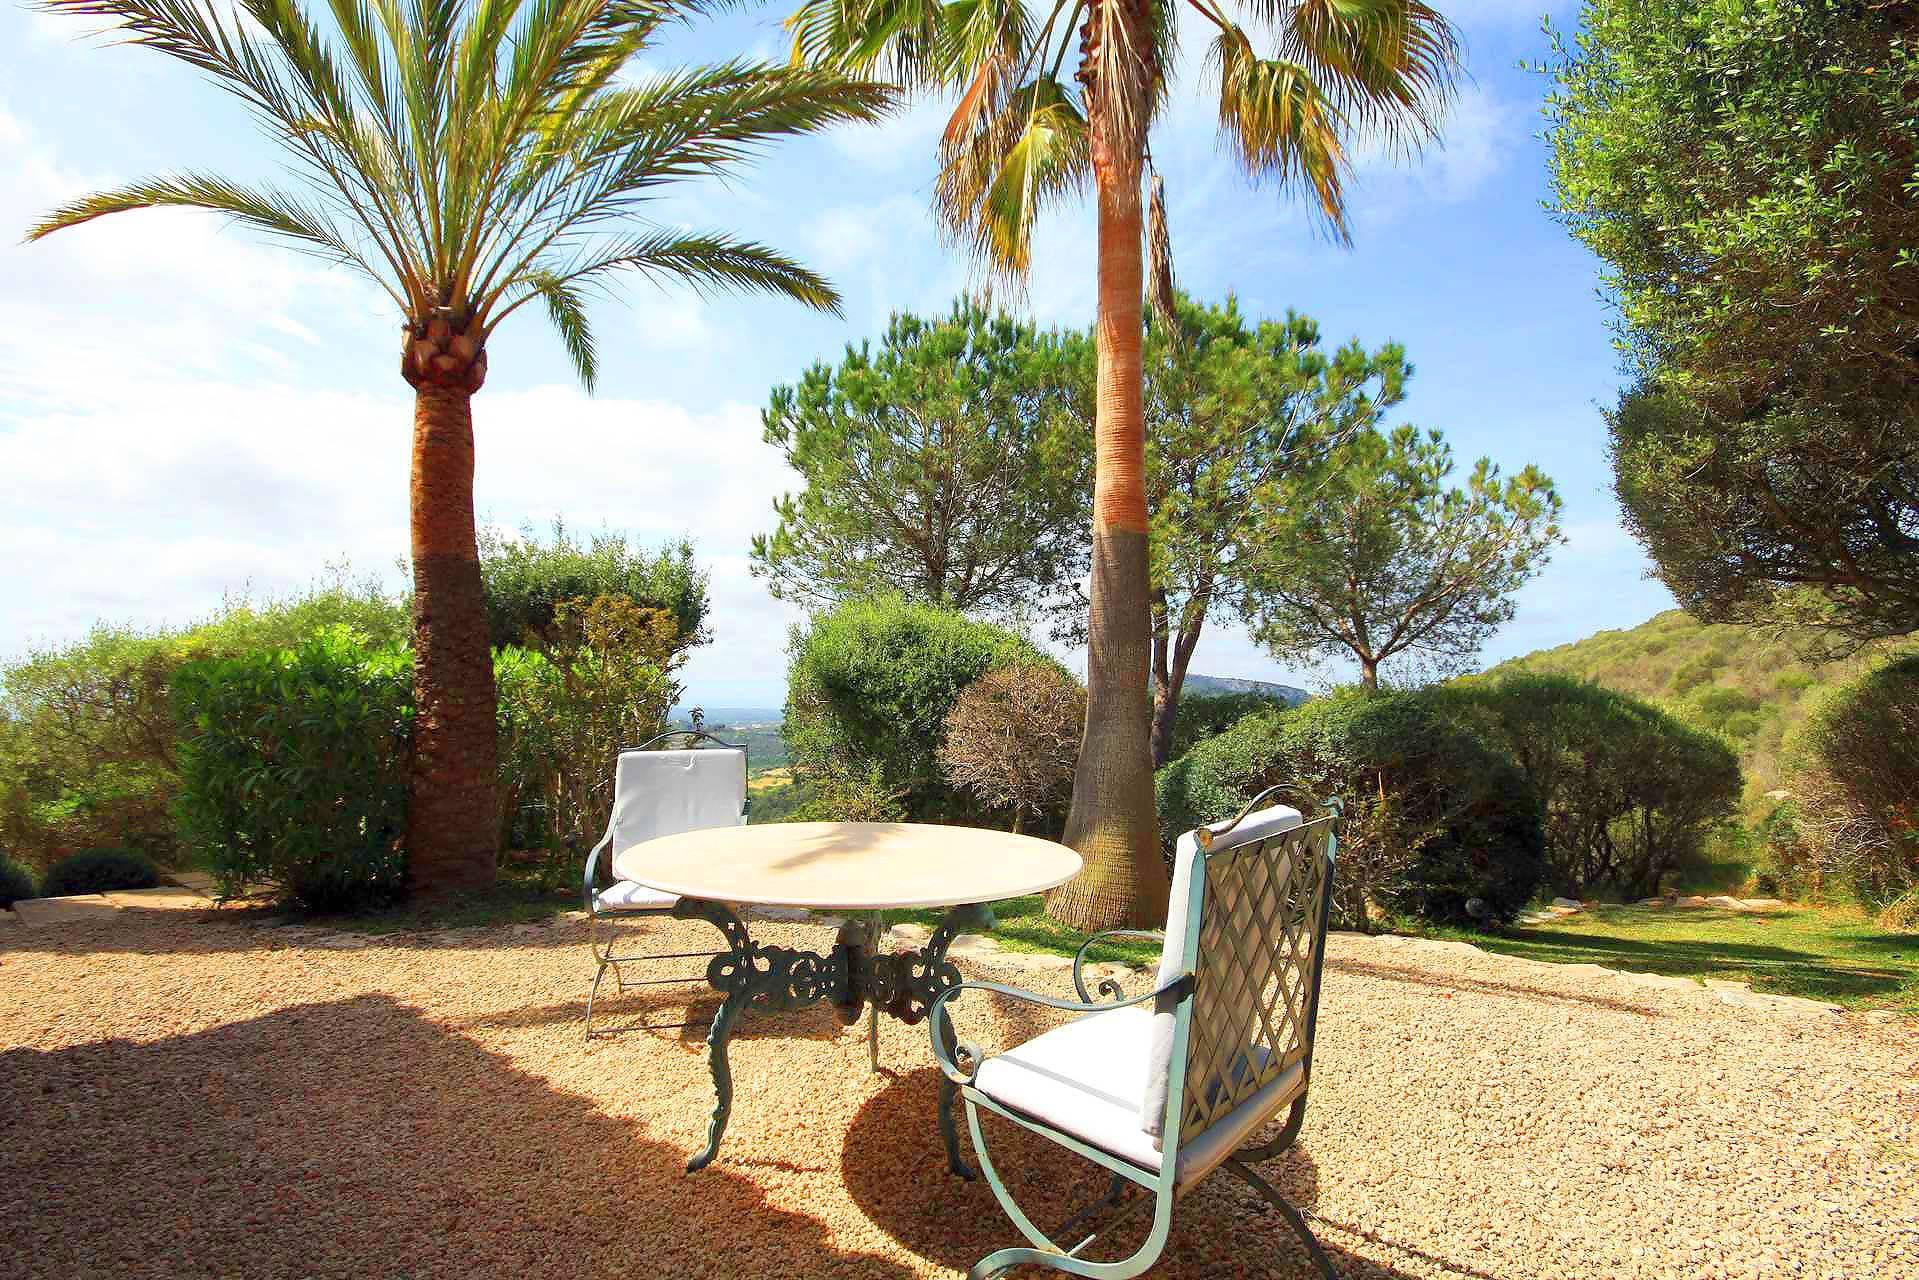 01-98 Extravagantes Ferienhaus Mallorca Osten Bild 9